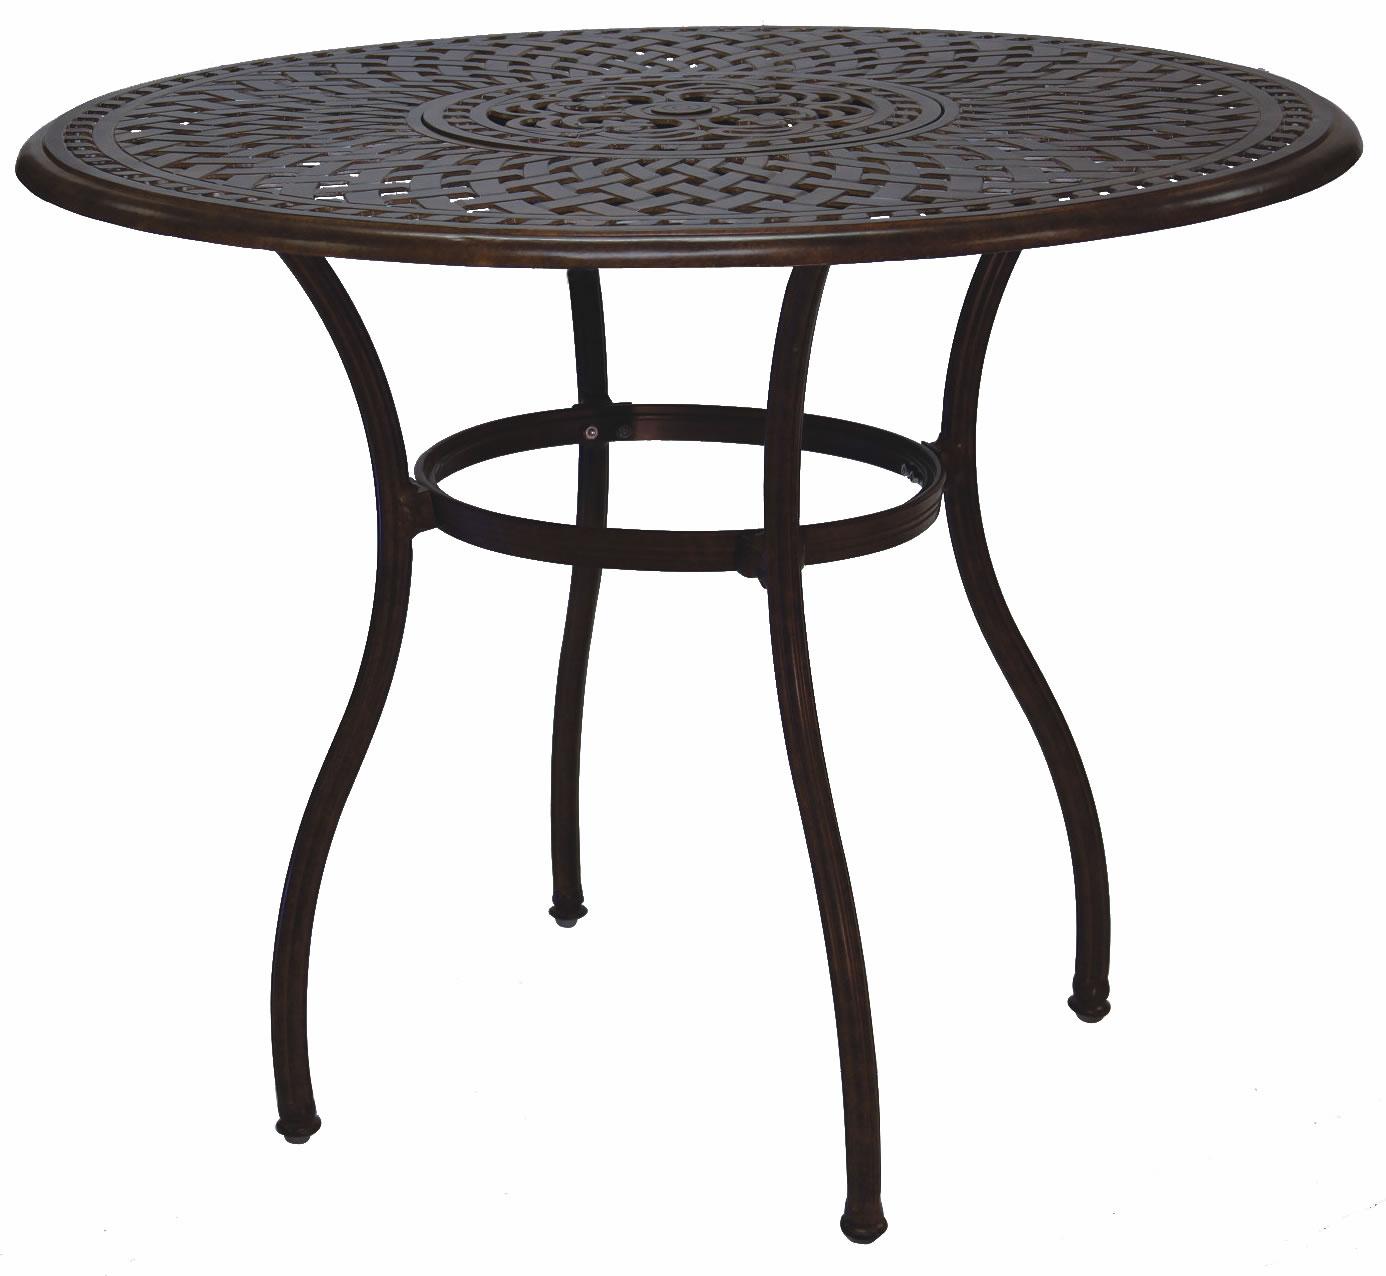 52 Round Table.Patio Furniture Dining Set Cast Aluminum 52 Round Table W Ice Bucket Insert 5pc Pub Sedona